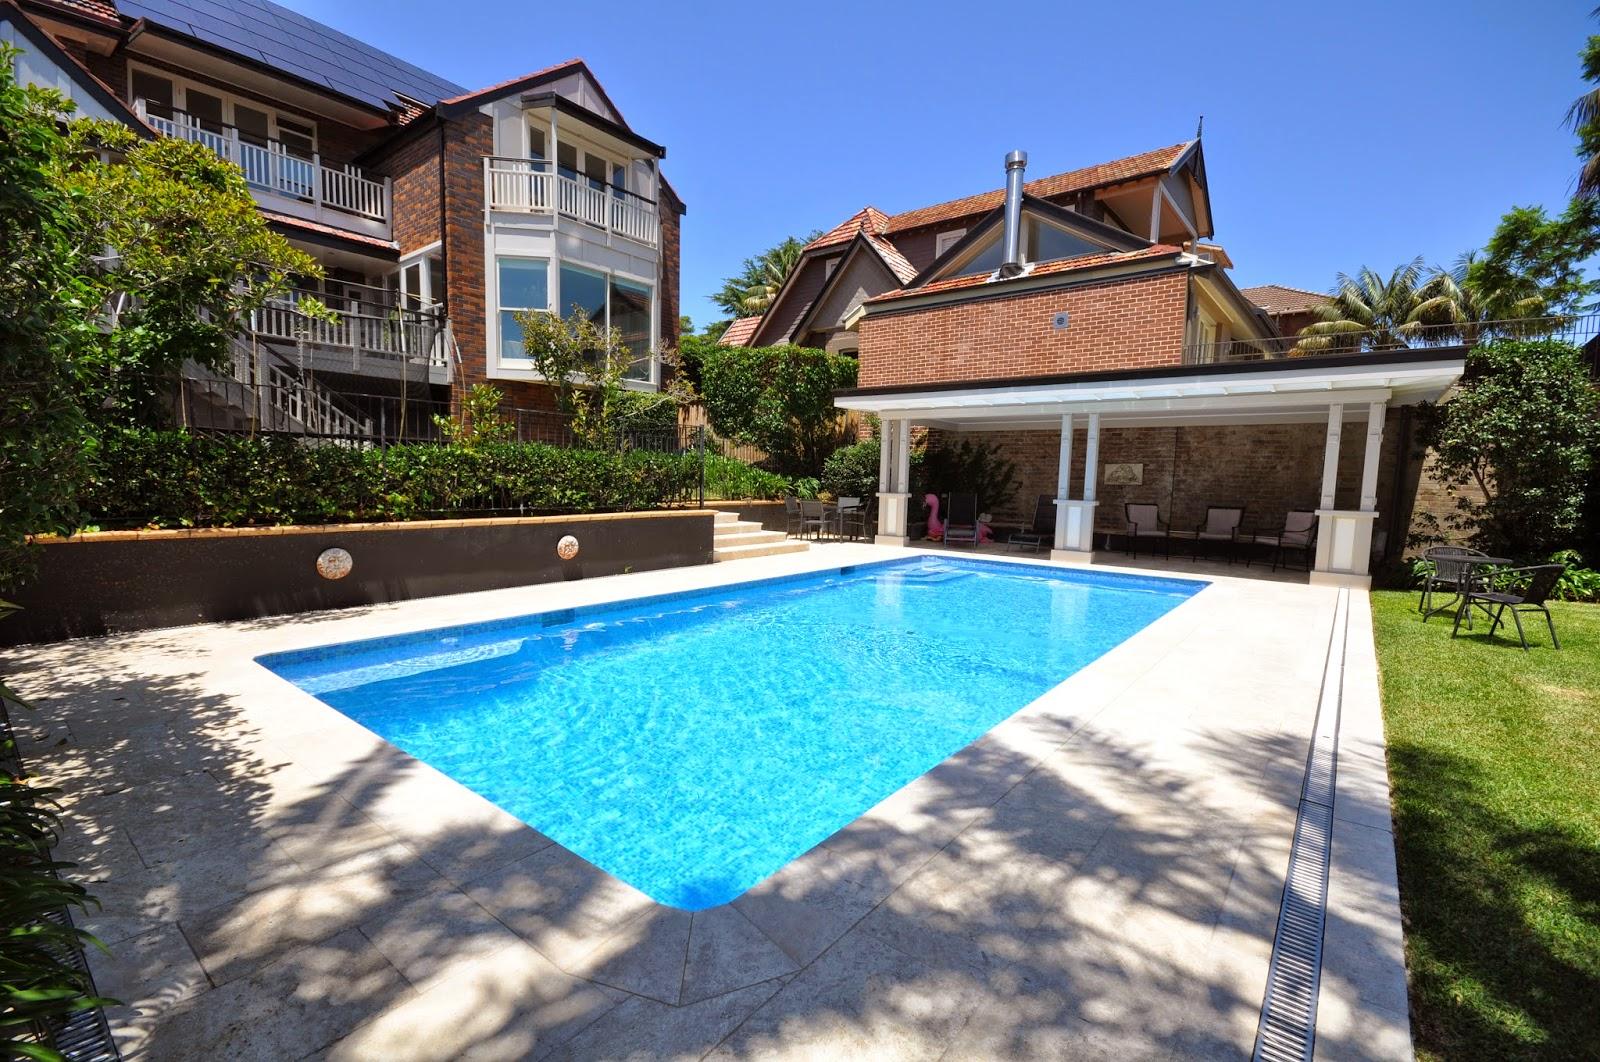 Ezarri Australia Guide To Building Or Renovating A Concrete Swimming Pool The Benefits Of